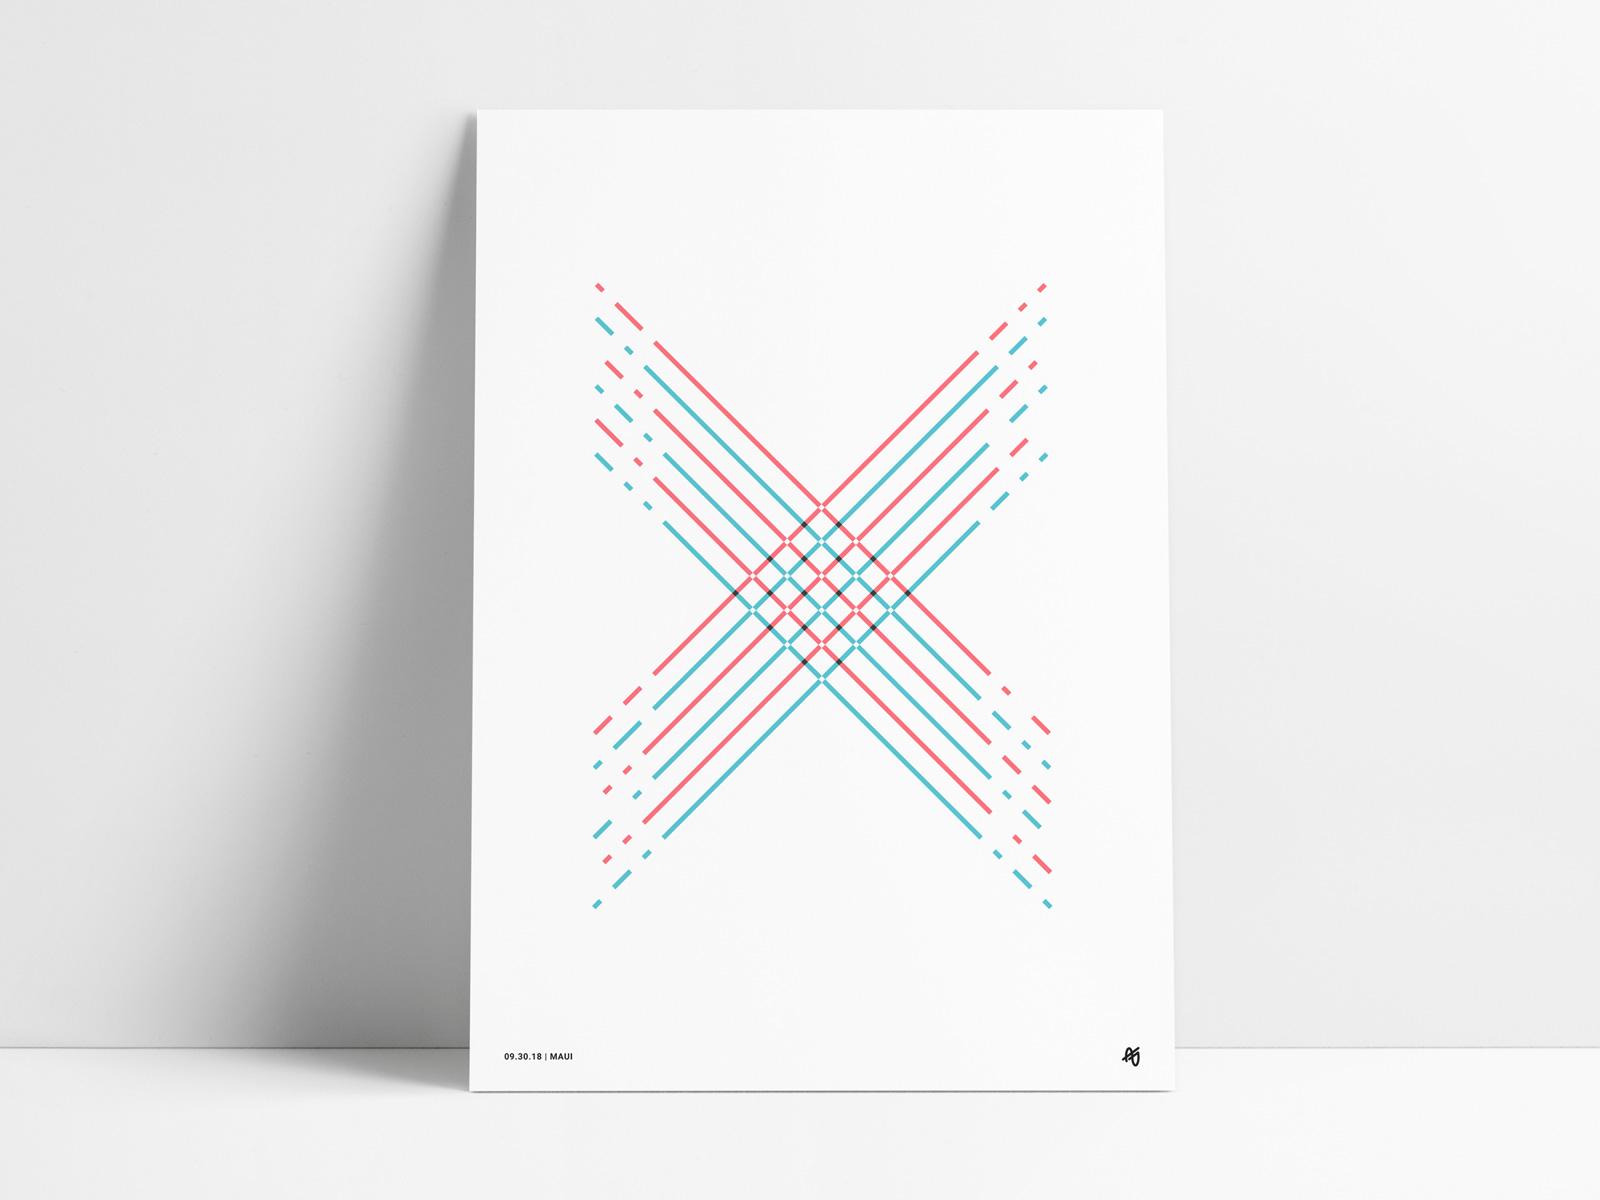 Line X Poster angled illustration aqua blue teal red striped letter shape retro modern fine art design abstract wall art art print poster line x